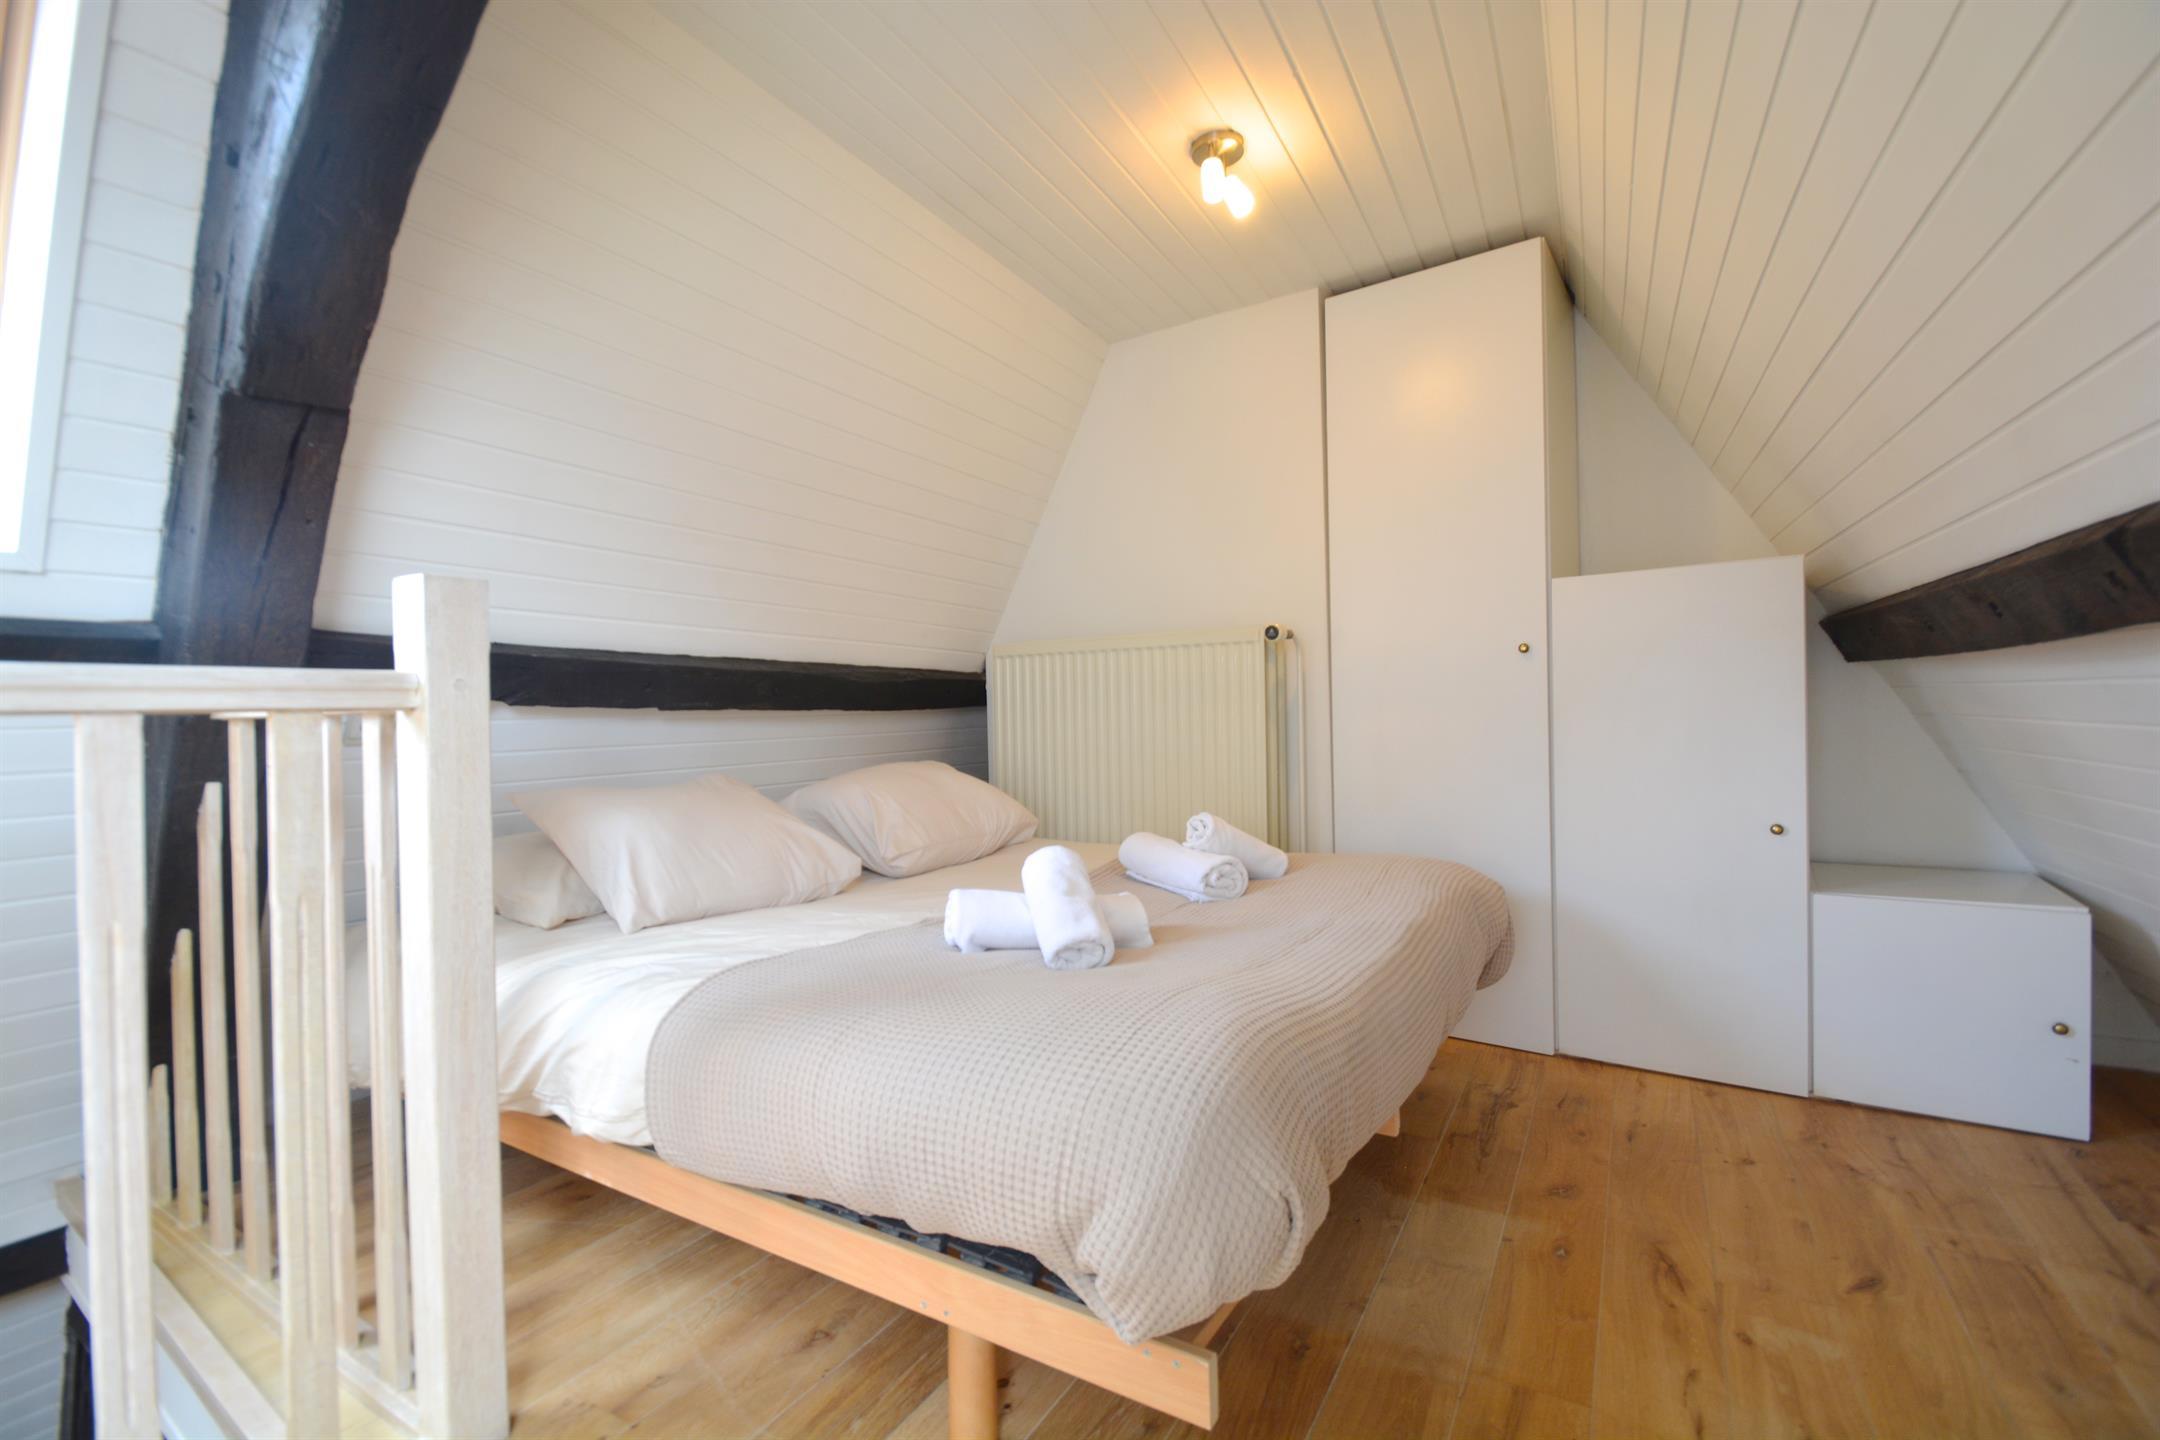 Duplex - Bruxelles - #4142819-10